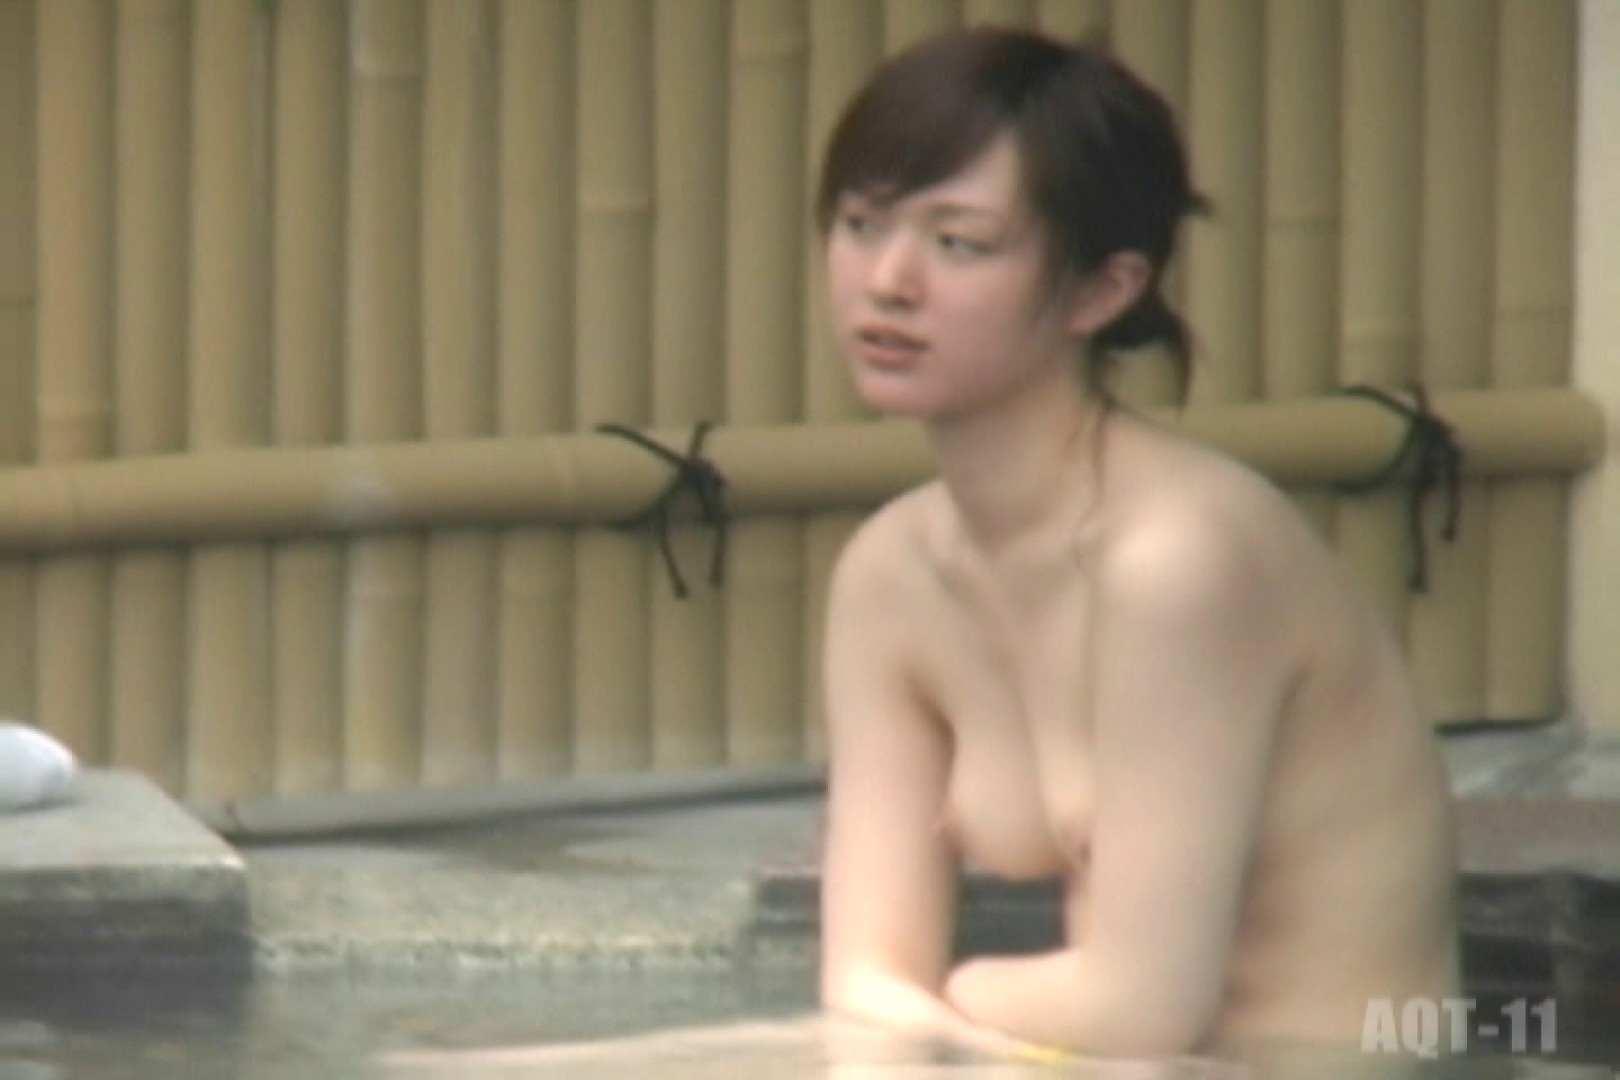 Aquaな露天風呂Vol.798 HなOL AV無料動画キャプチャ 109pic 27